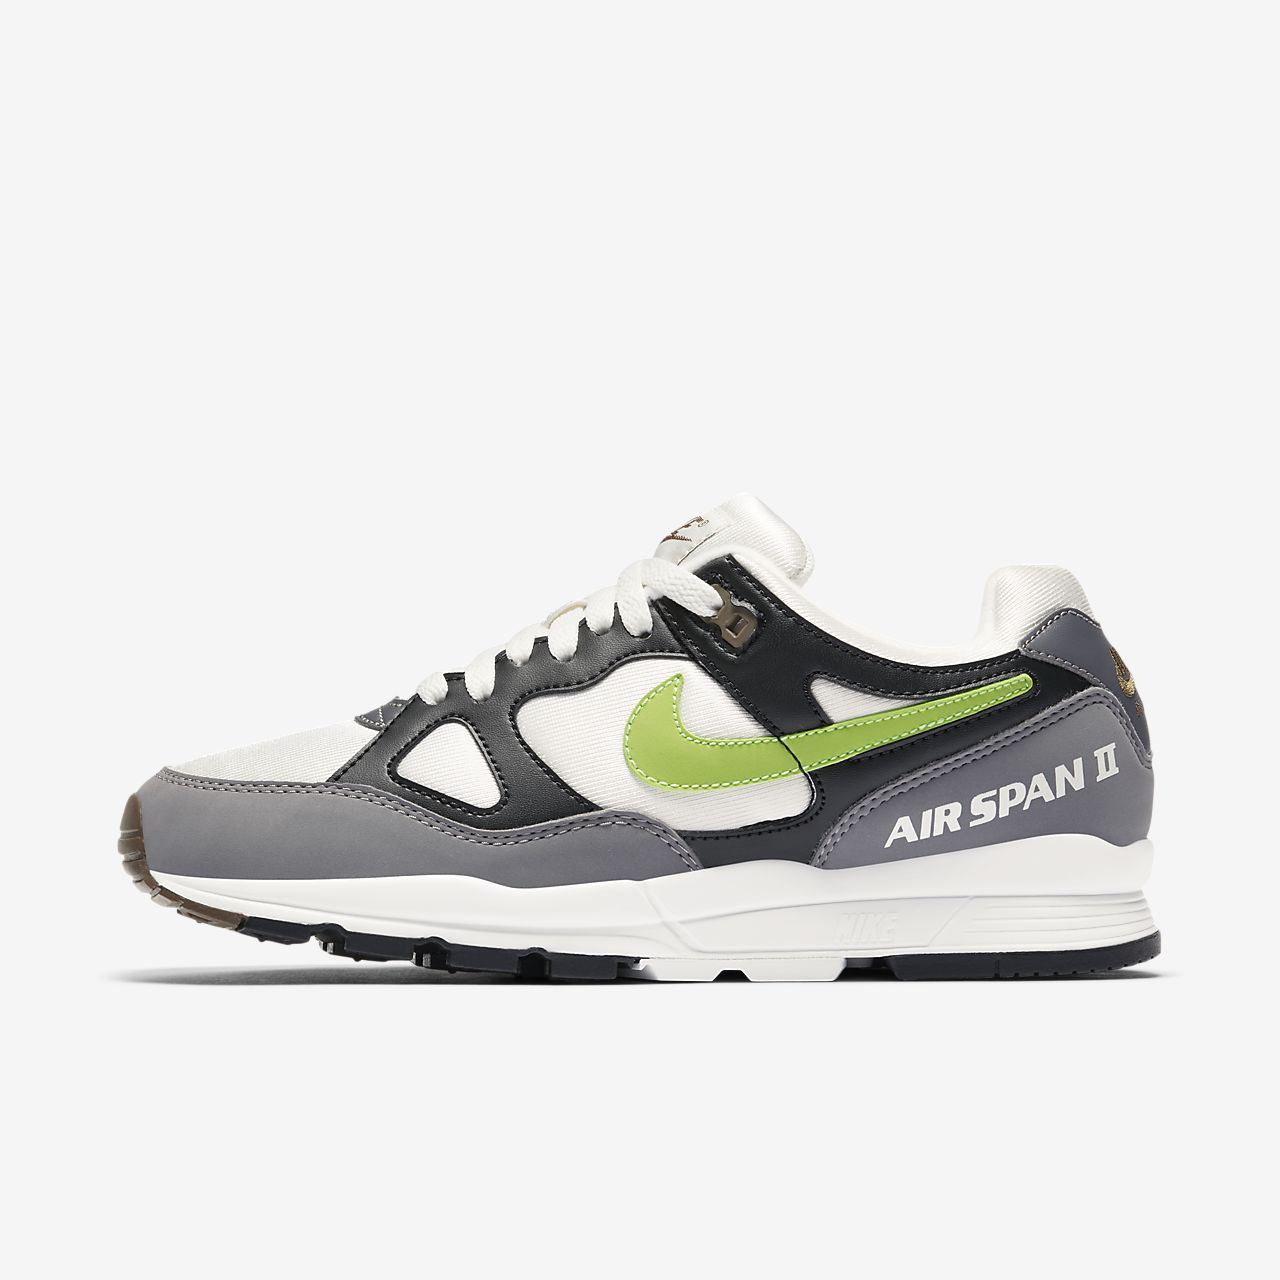 Women's ShoeBe Span Air Ii Nike CdosQthrxB